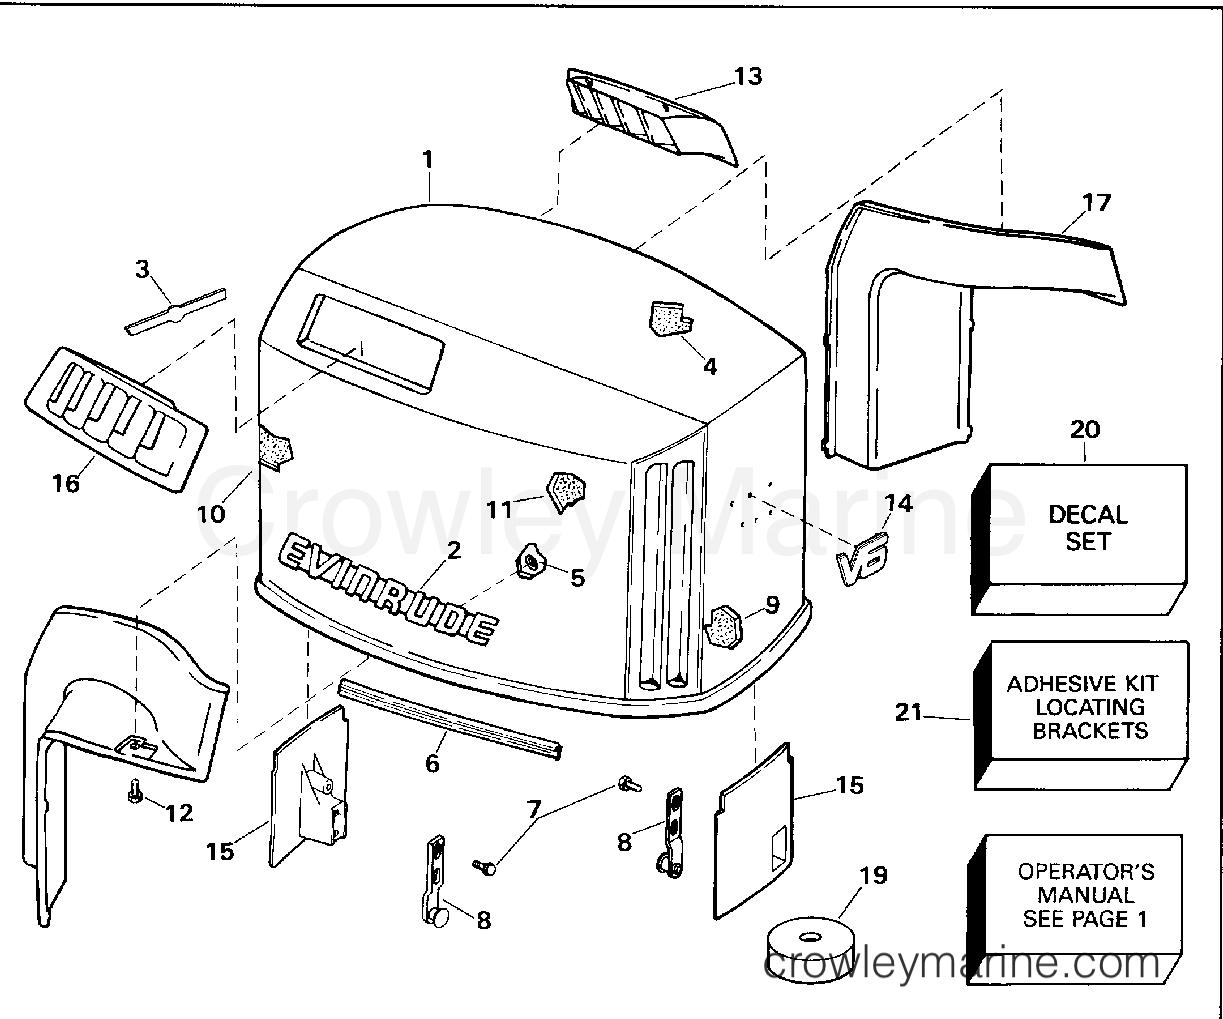 1994 OMC Quiet Rider 150 - 150SHLERC ENGINE COVER - EVINRUDE section